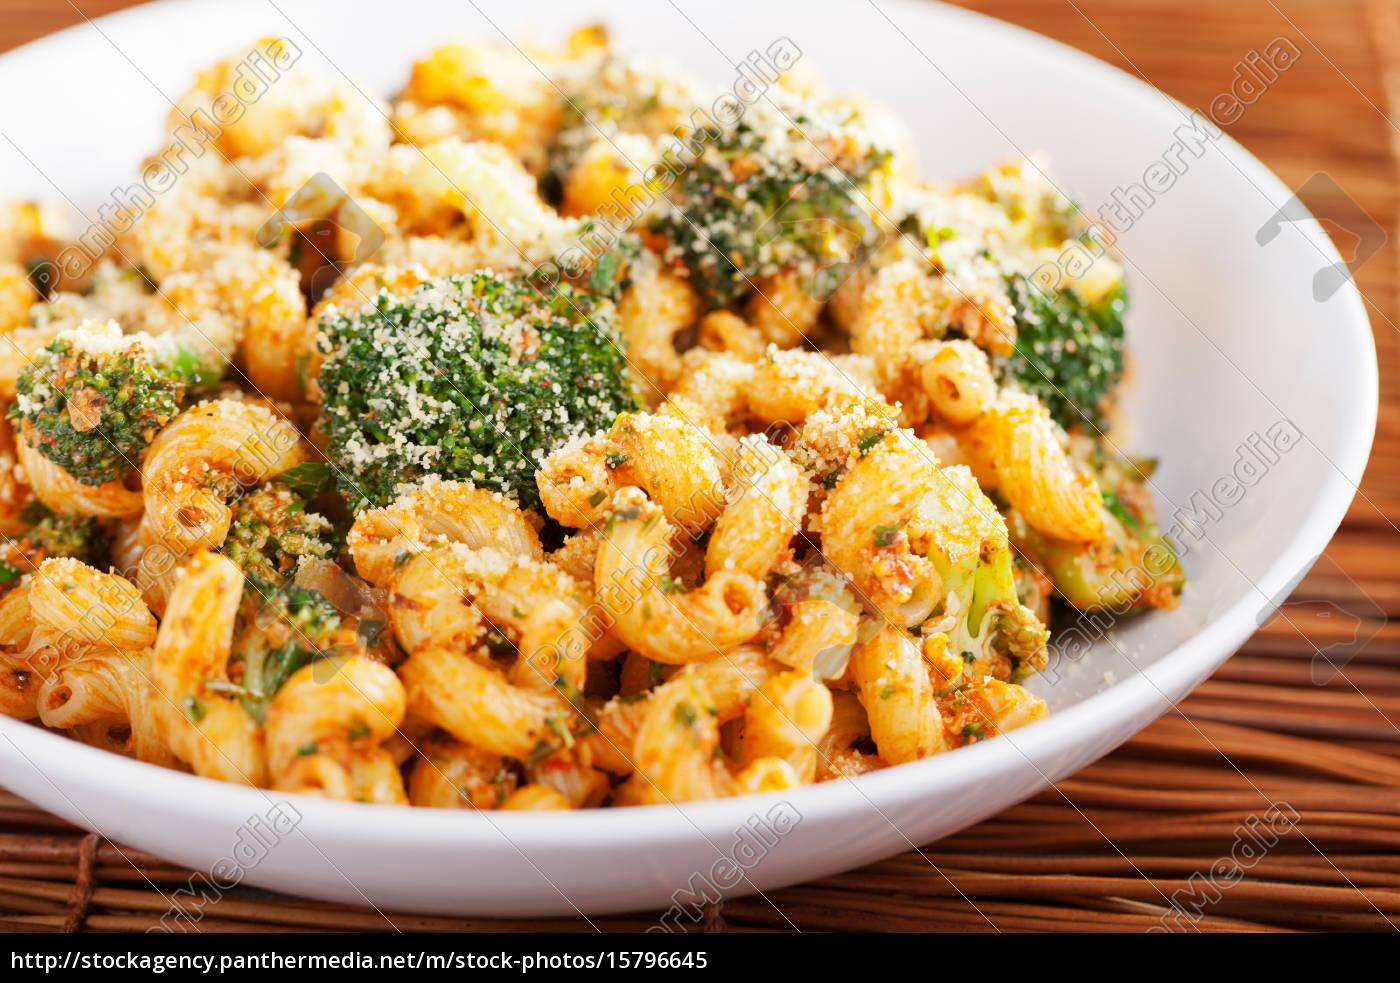 pasta, with, broccoli, pasta, with, broccoli, pasta, with - 15796645